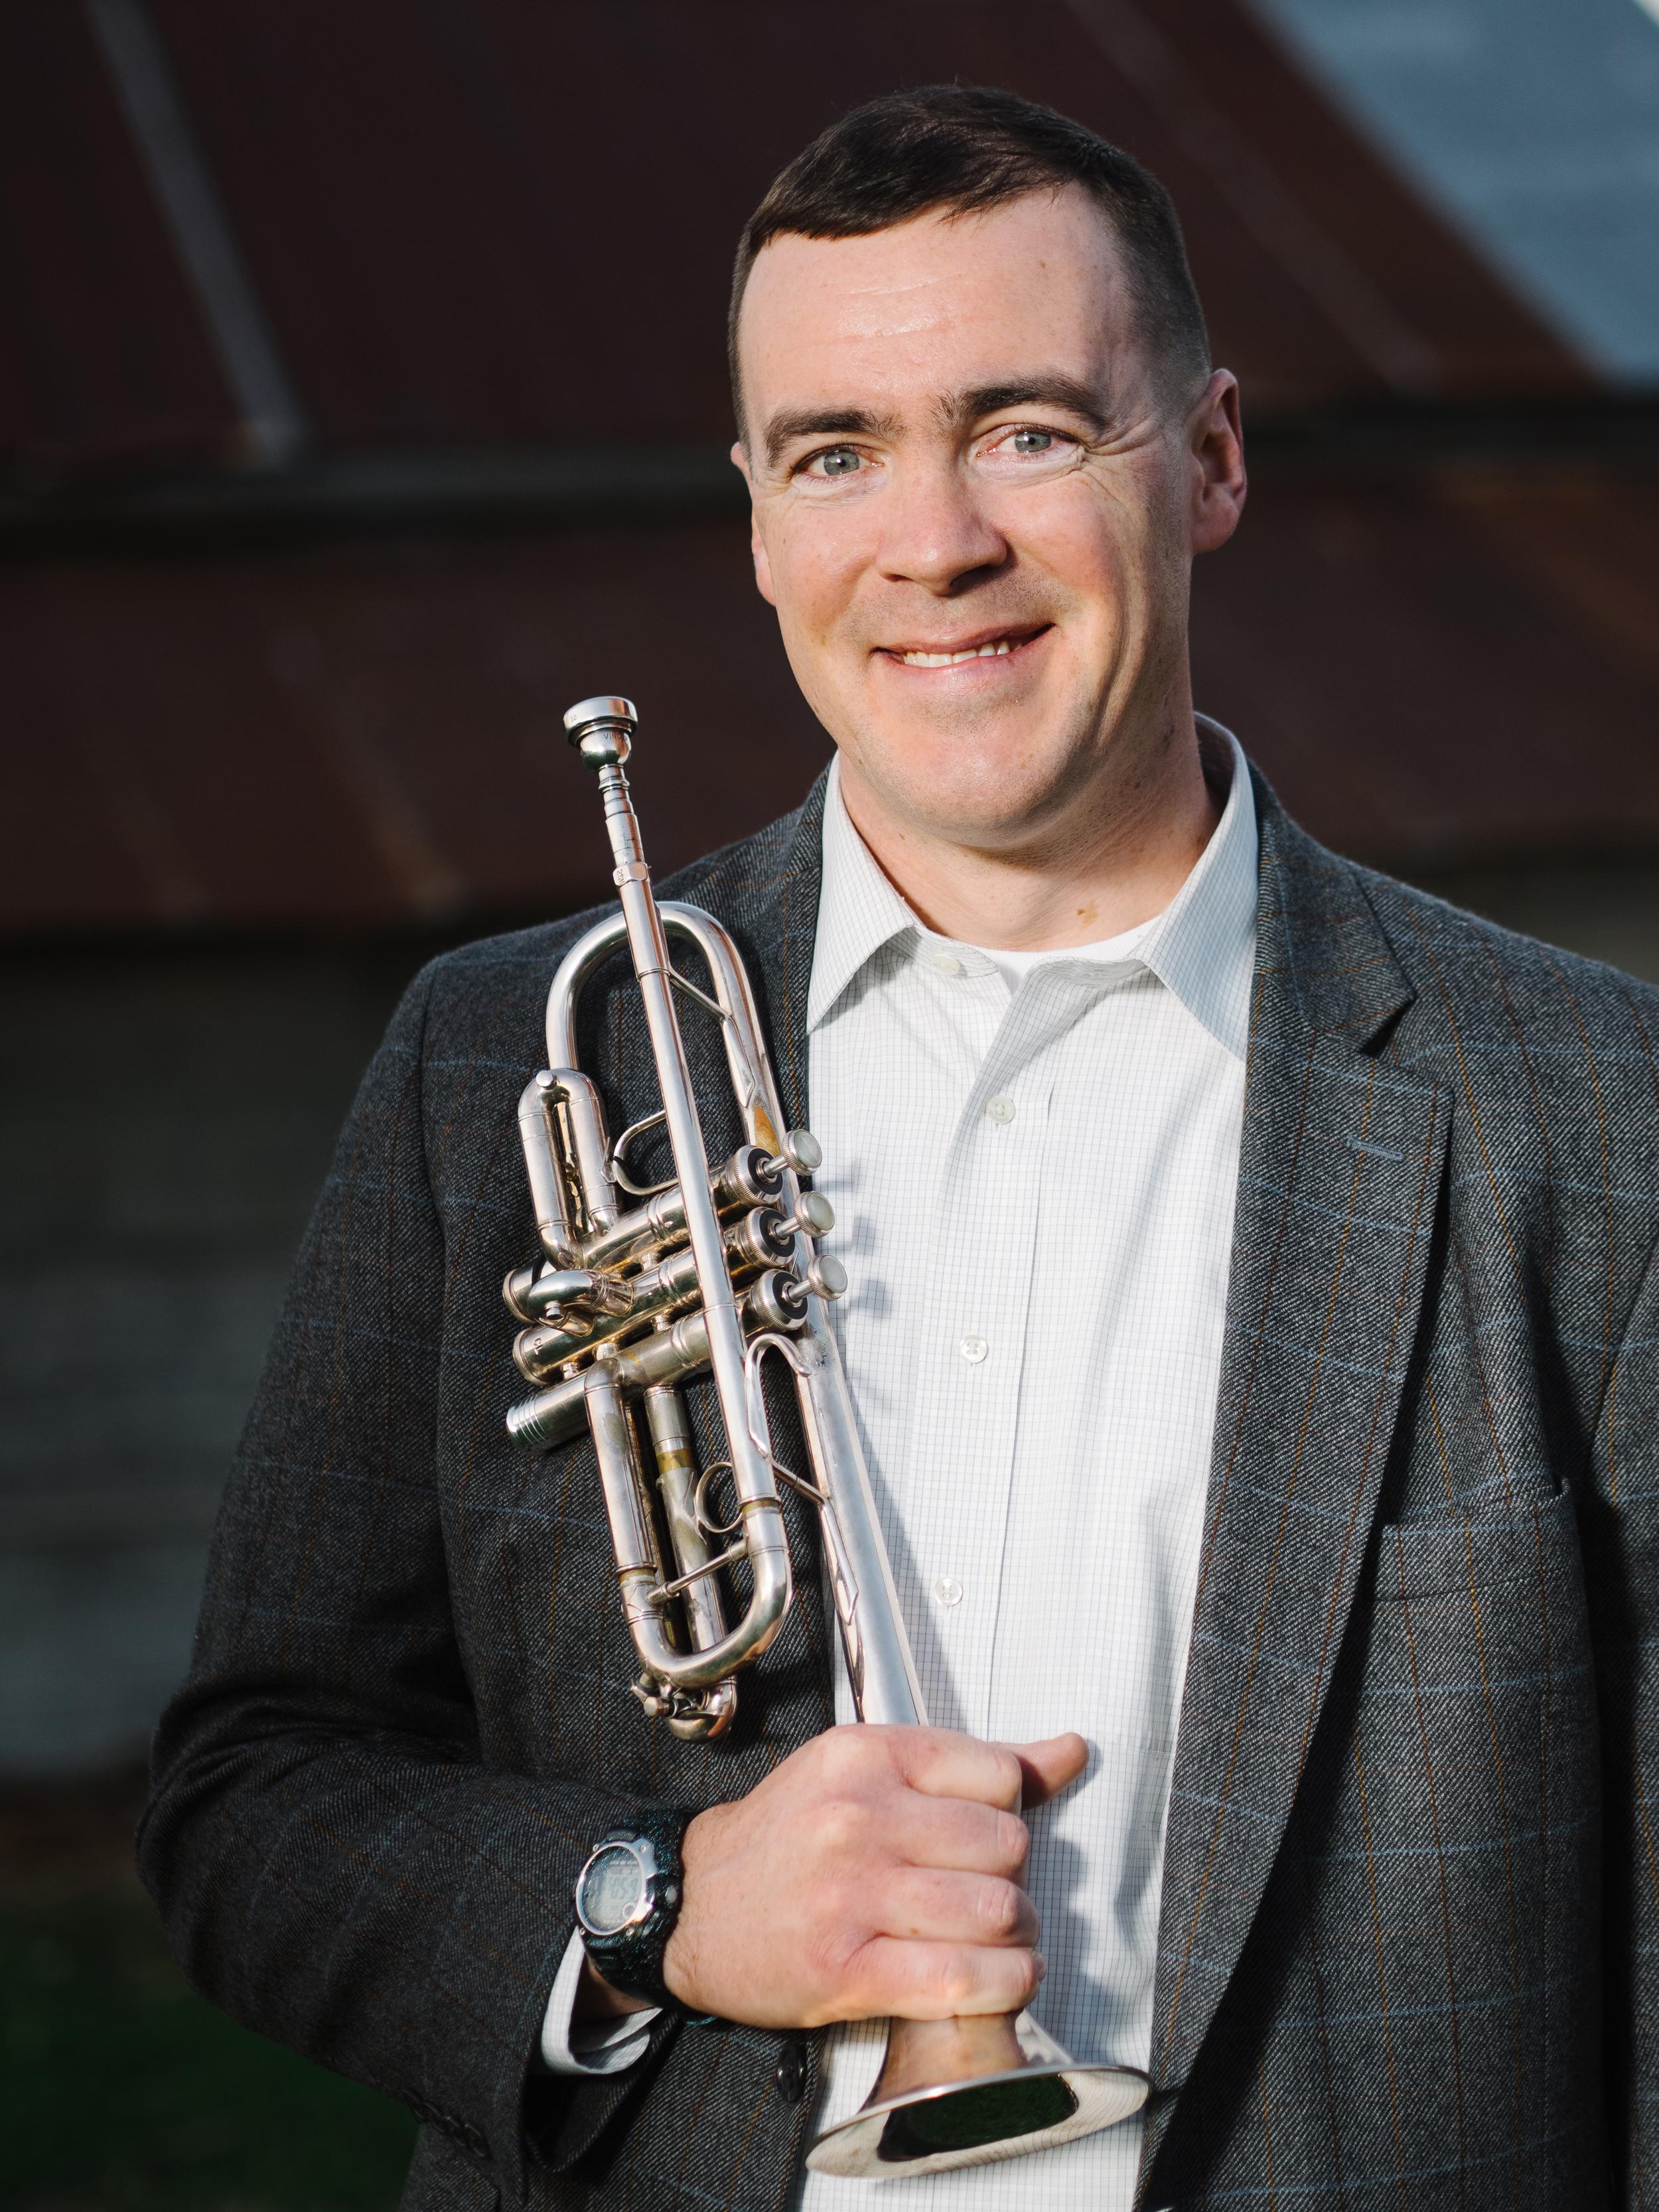 A portrait of new CCM faculty member Michael Mergen holding a trumpet.